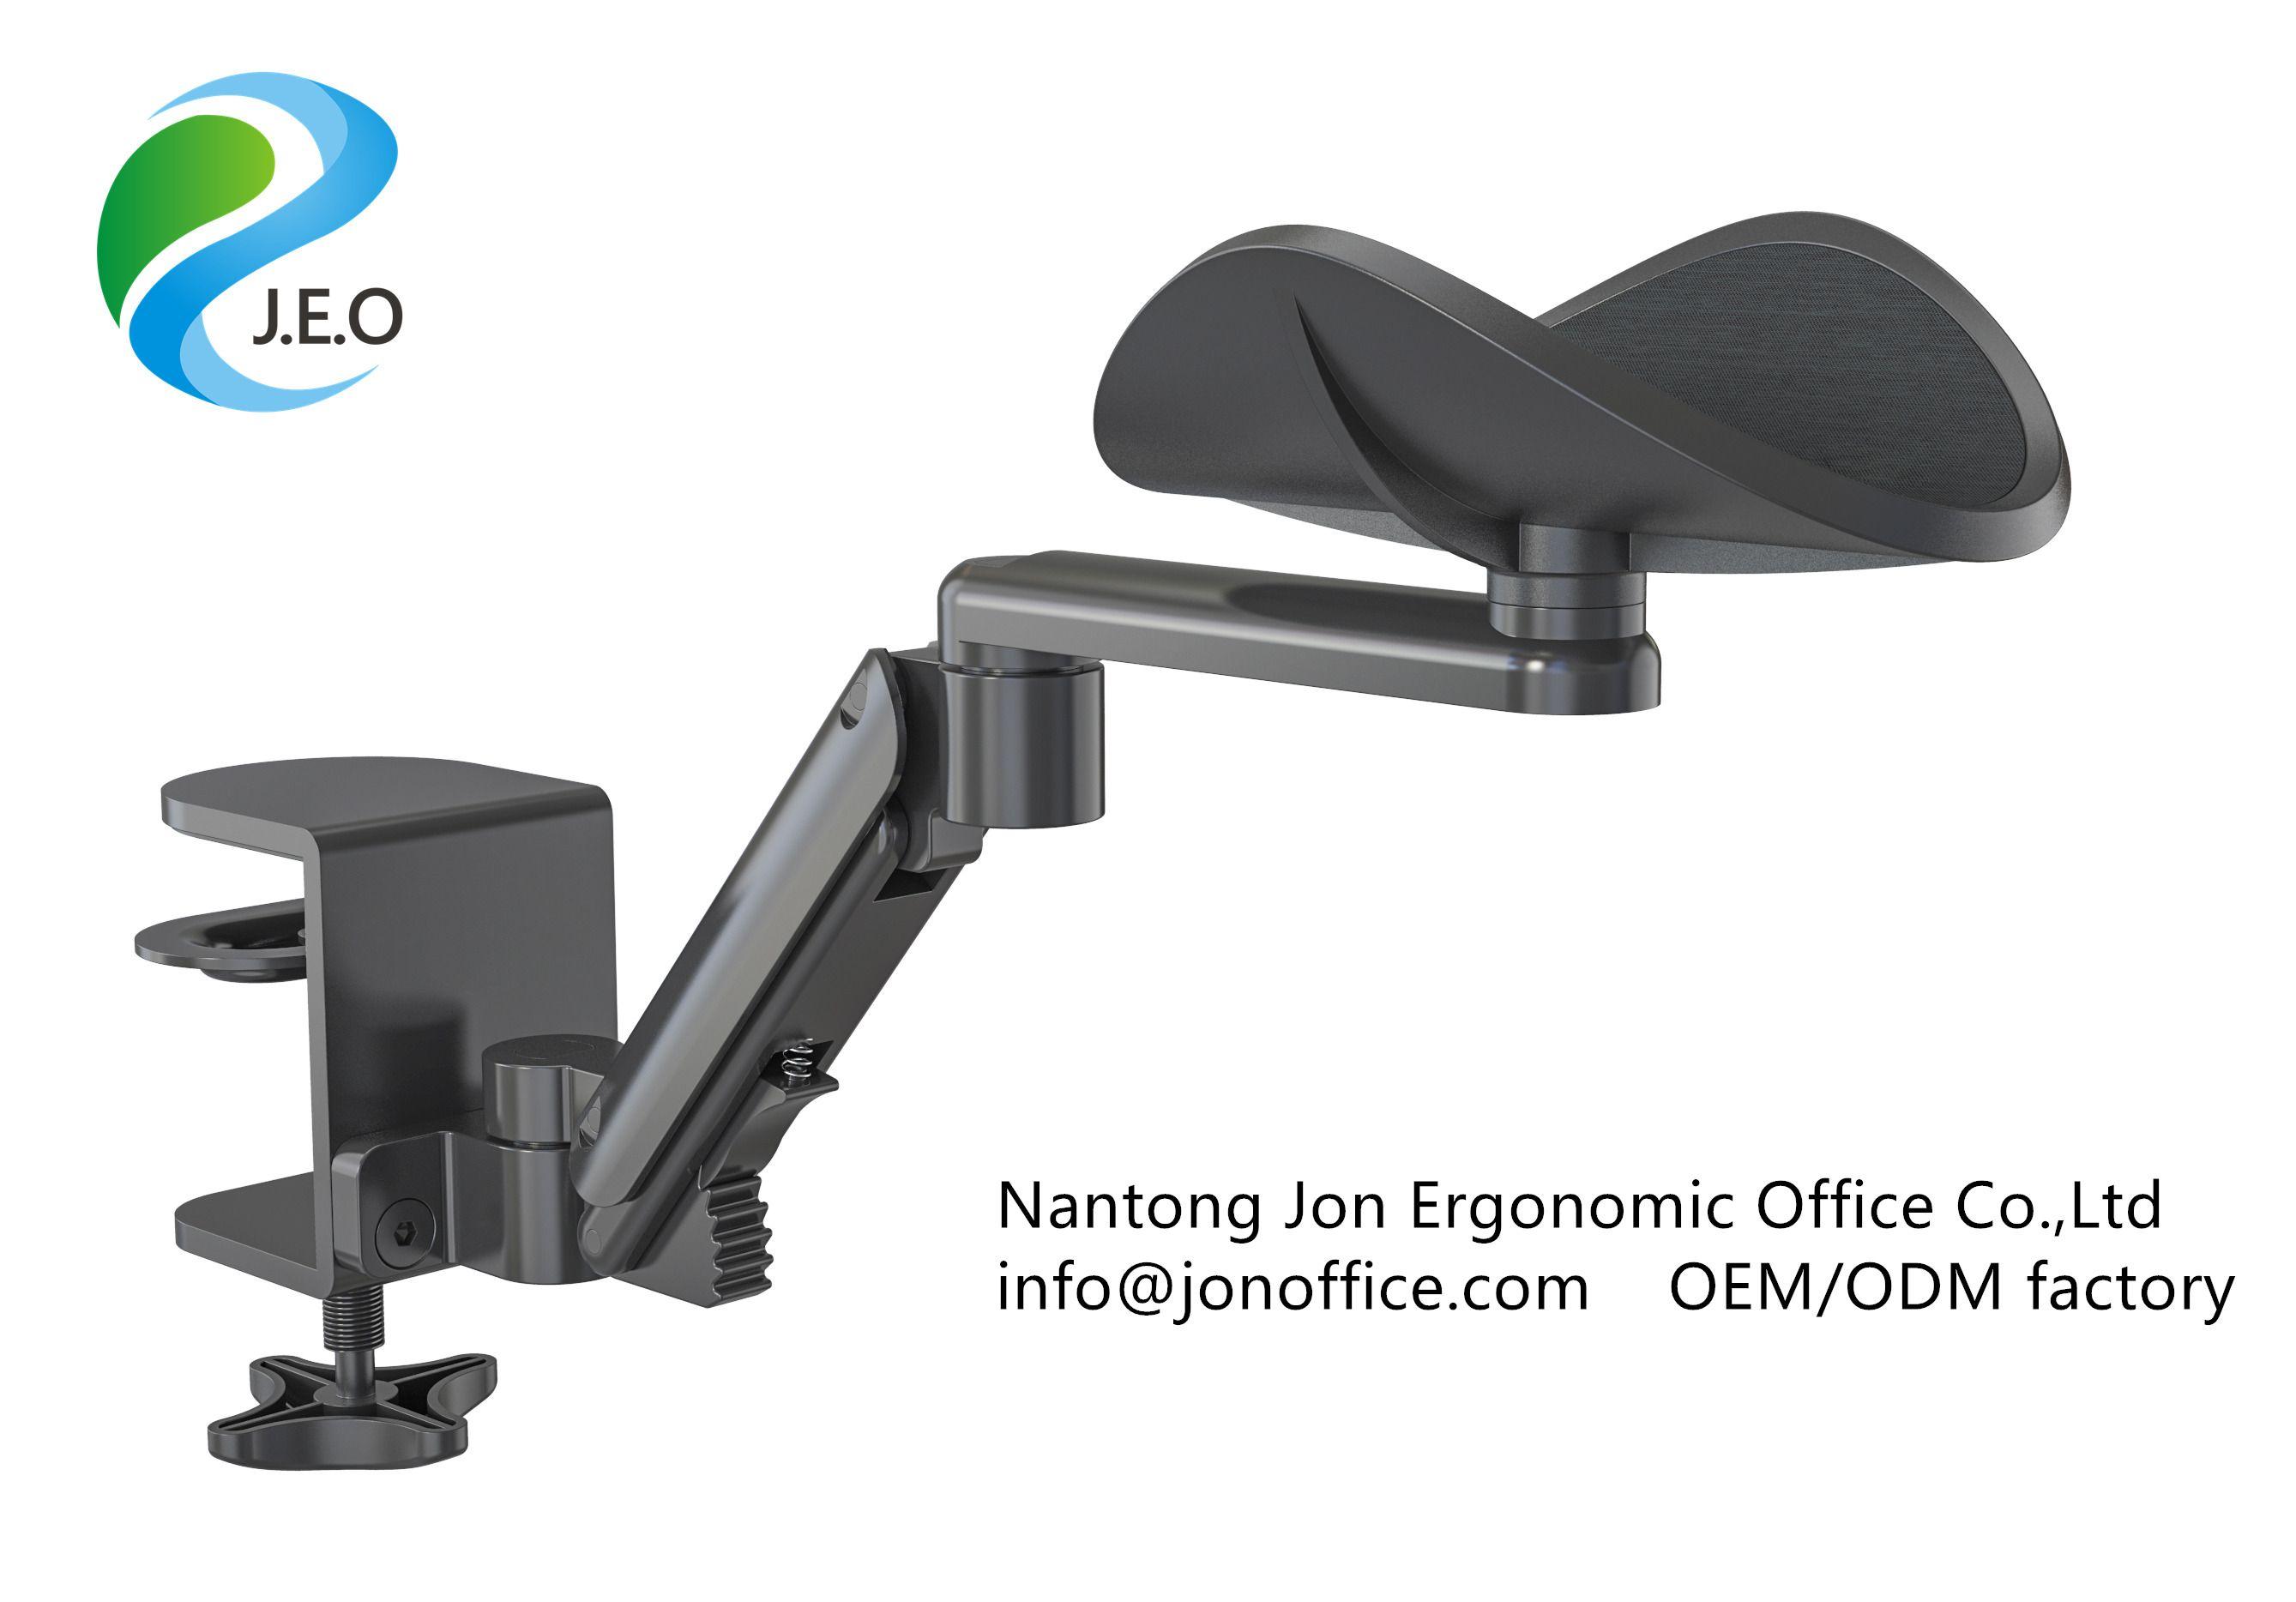 Clamp On Adjustable Armrest Desk Cradle Rotating Elbow Cushion Above Table Extension Platform Elbow Cushion Table Extension Clamp